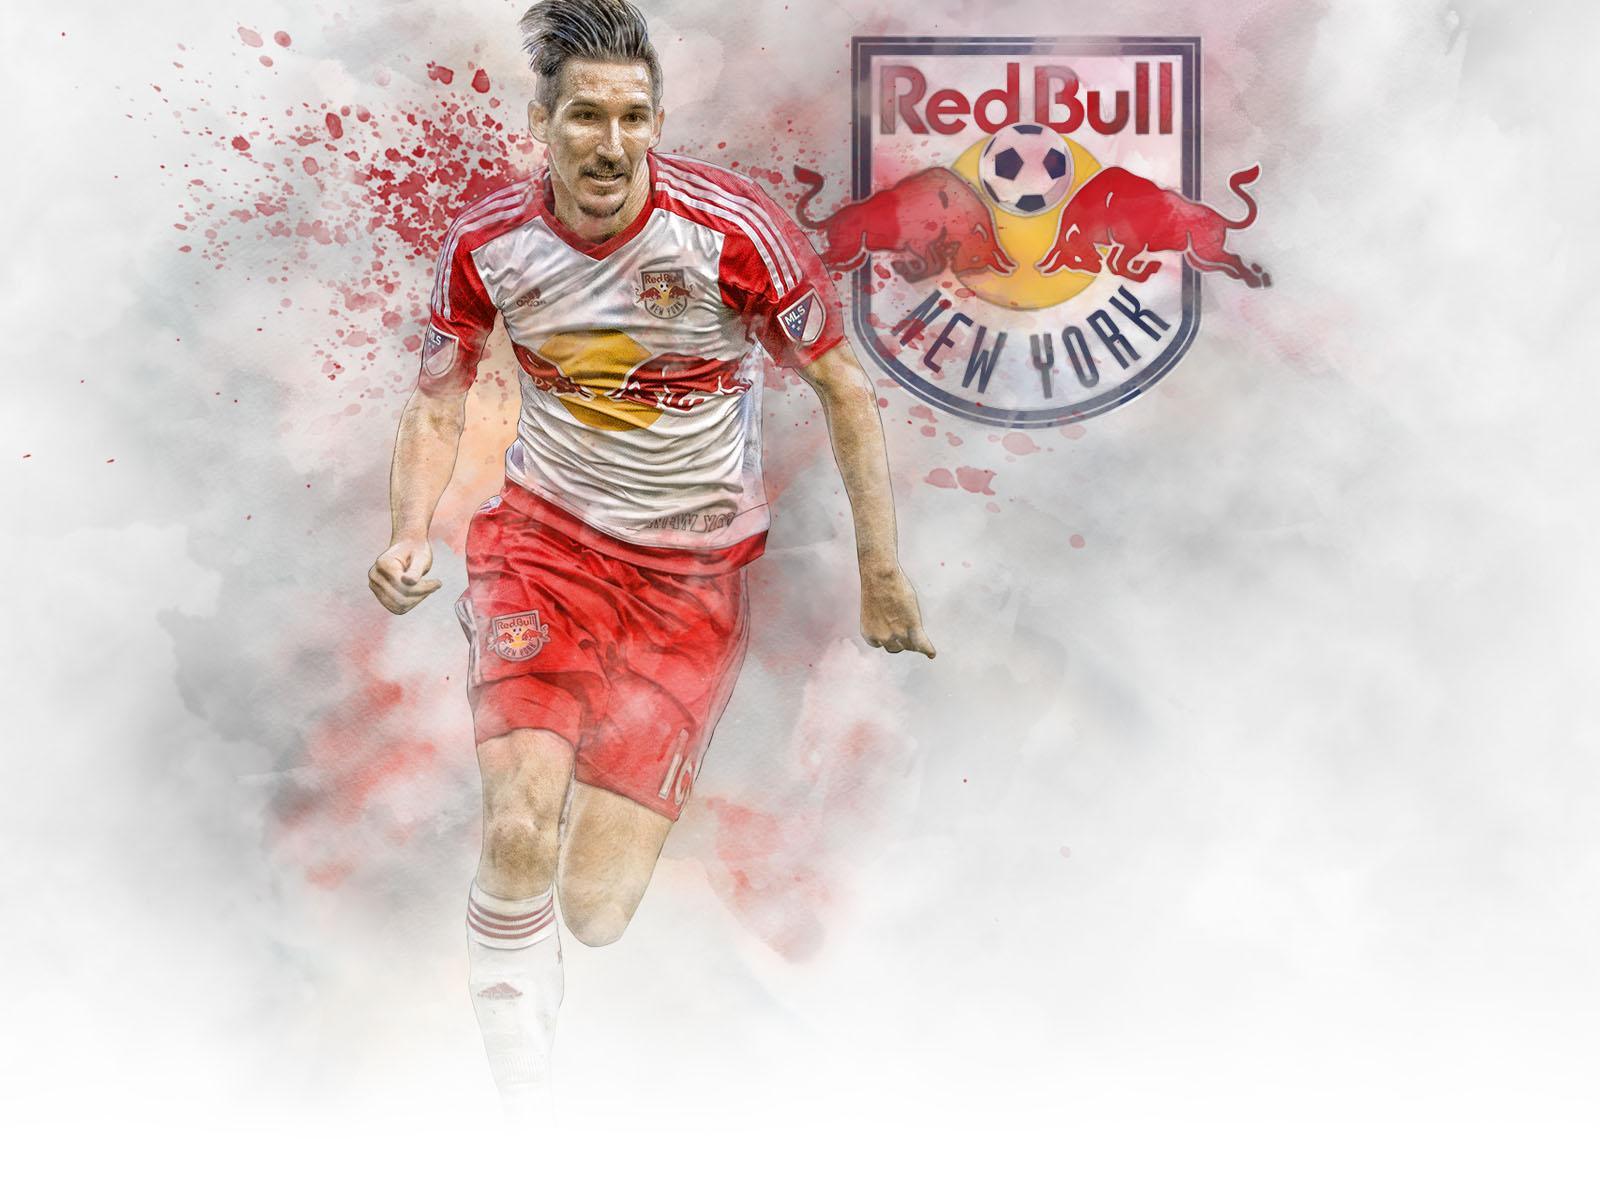 New York Red Bulls Mls Soccer Sports Wallpaper 1600x1200